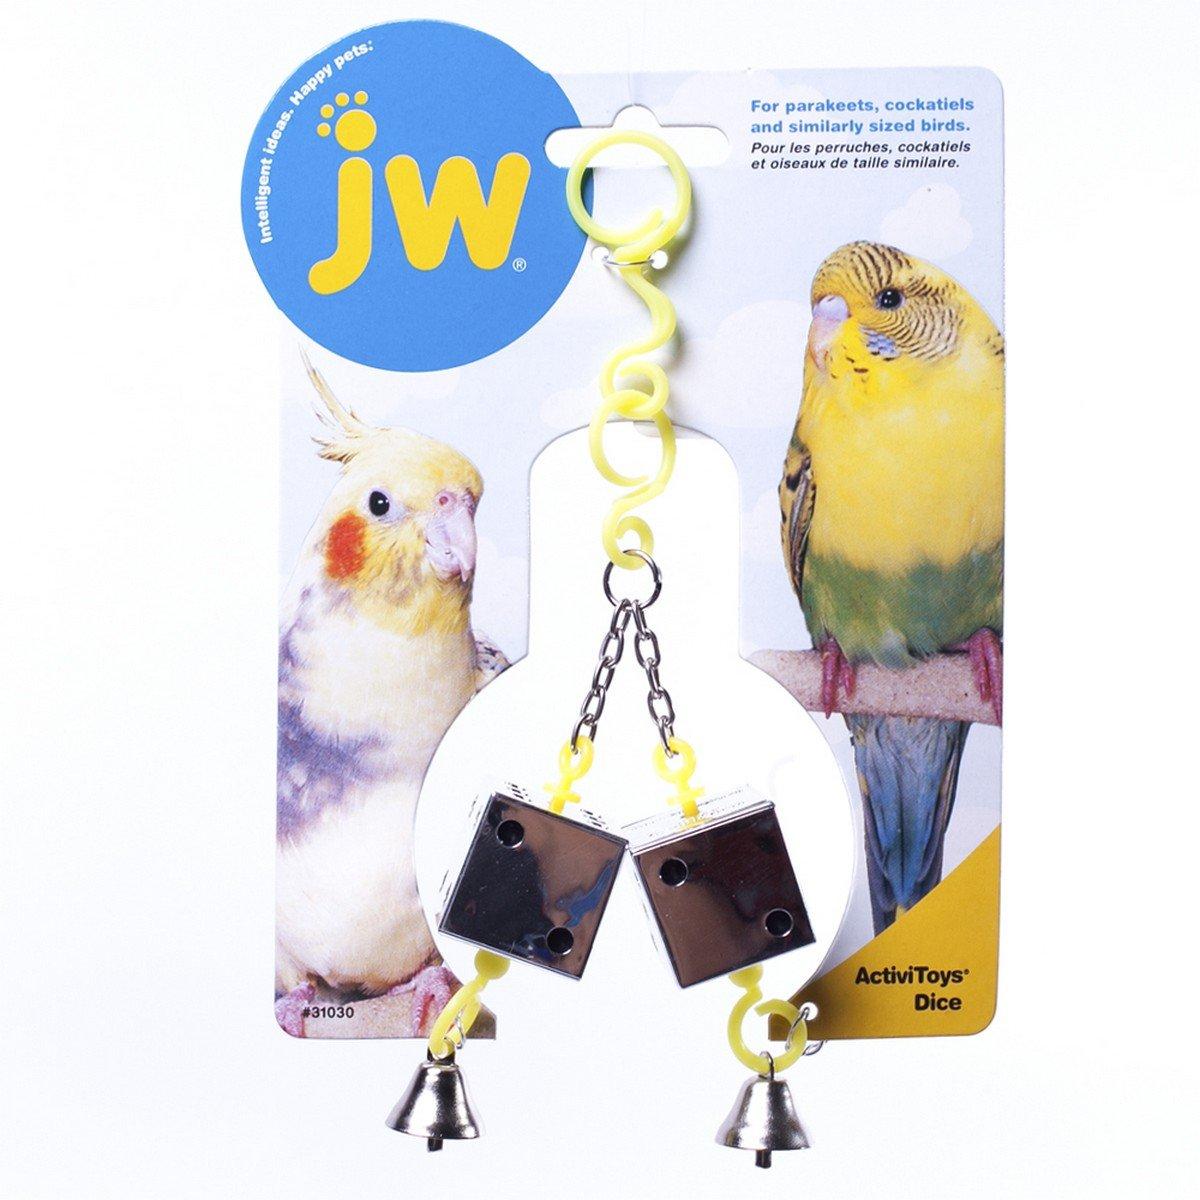 Imagem de JW Activitoy Dice Toy